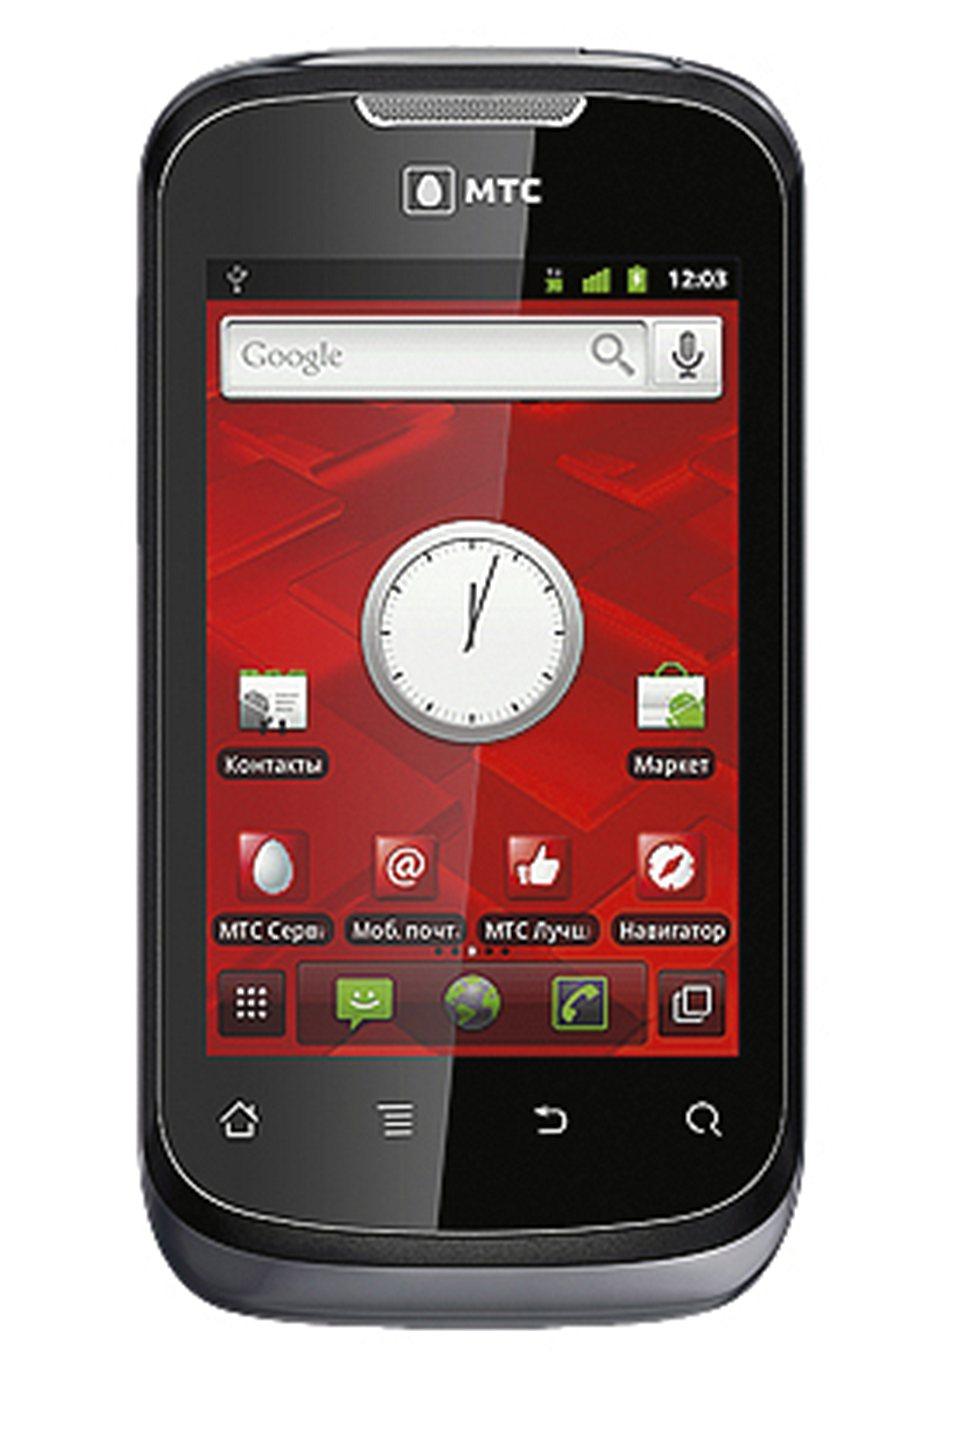 Приз: Android-смартфон МТС 955